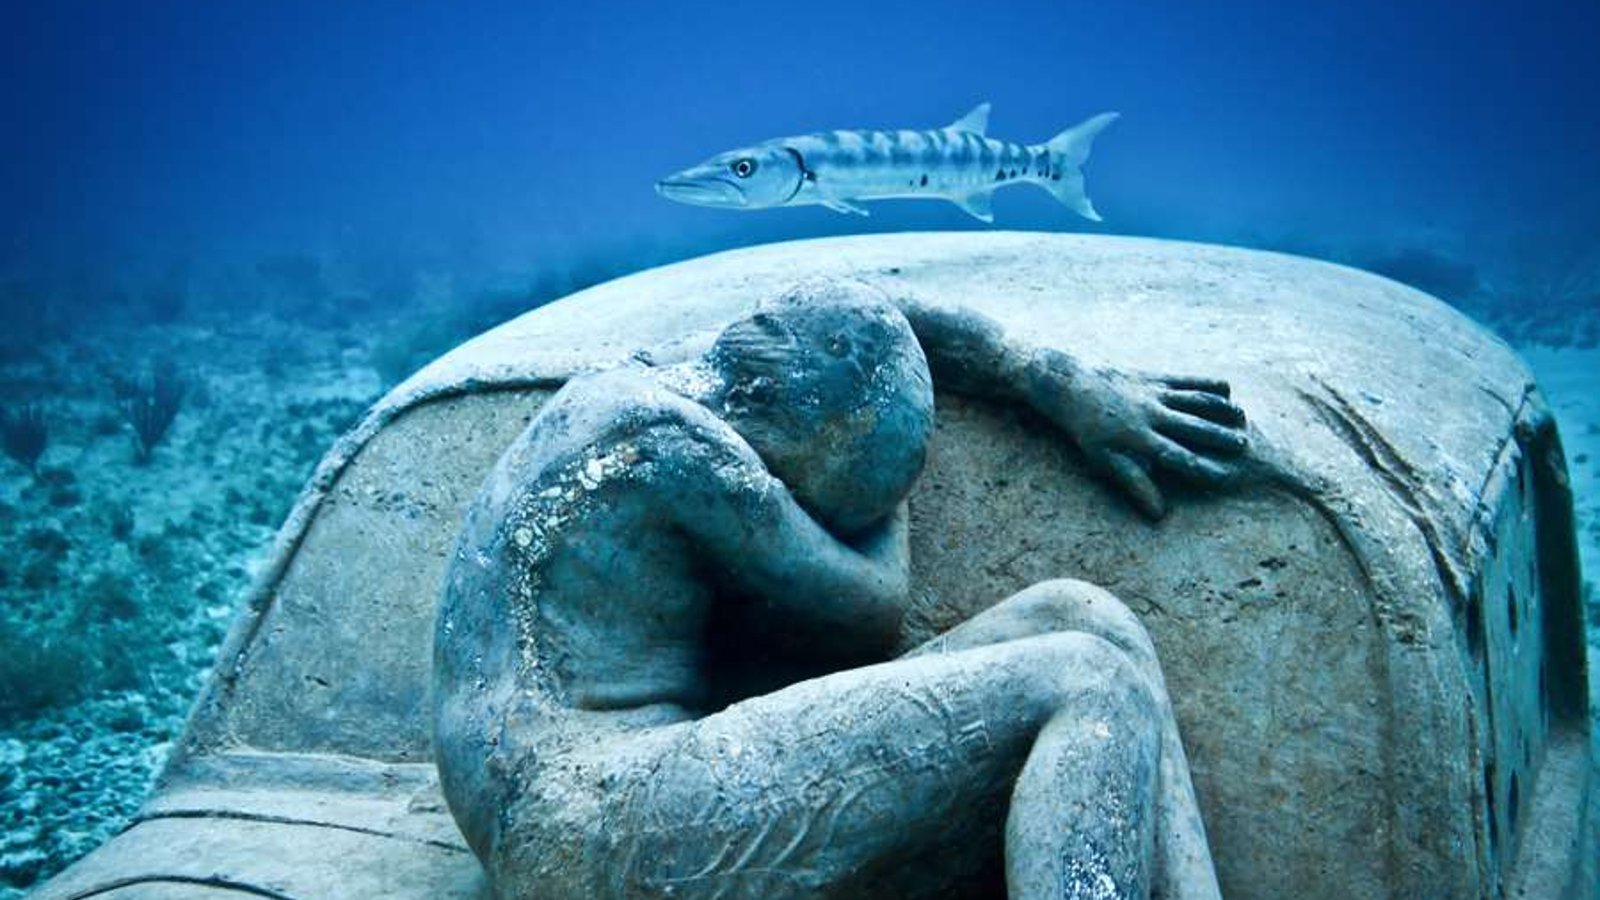 Angel Azul - An Artist Creating Artificial Coral Reef